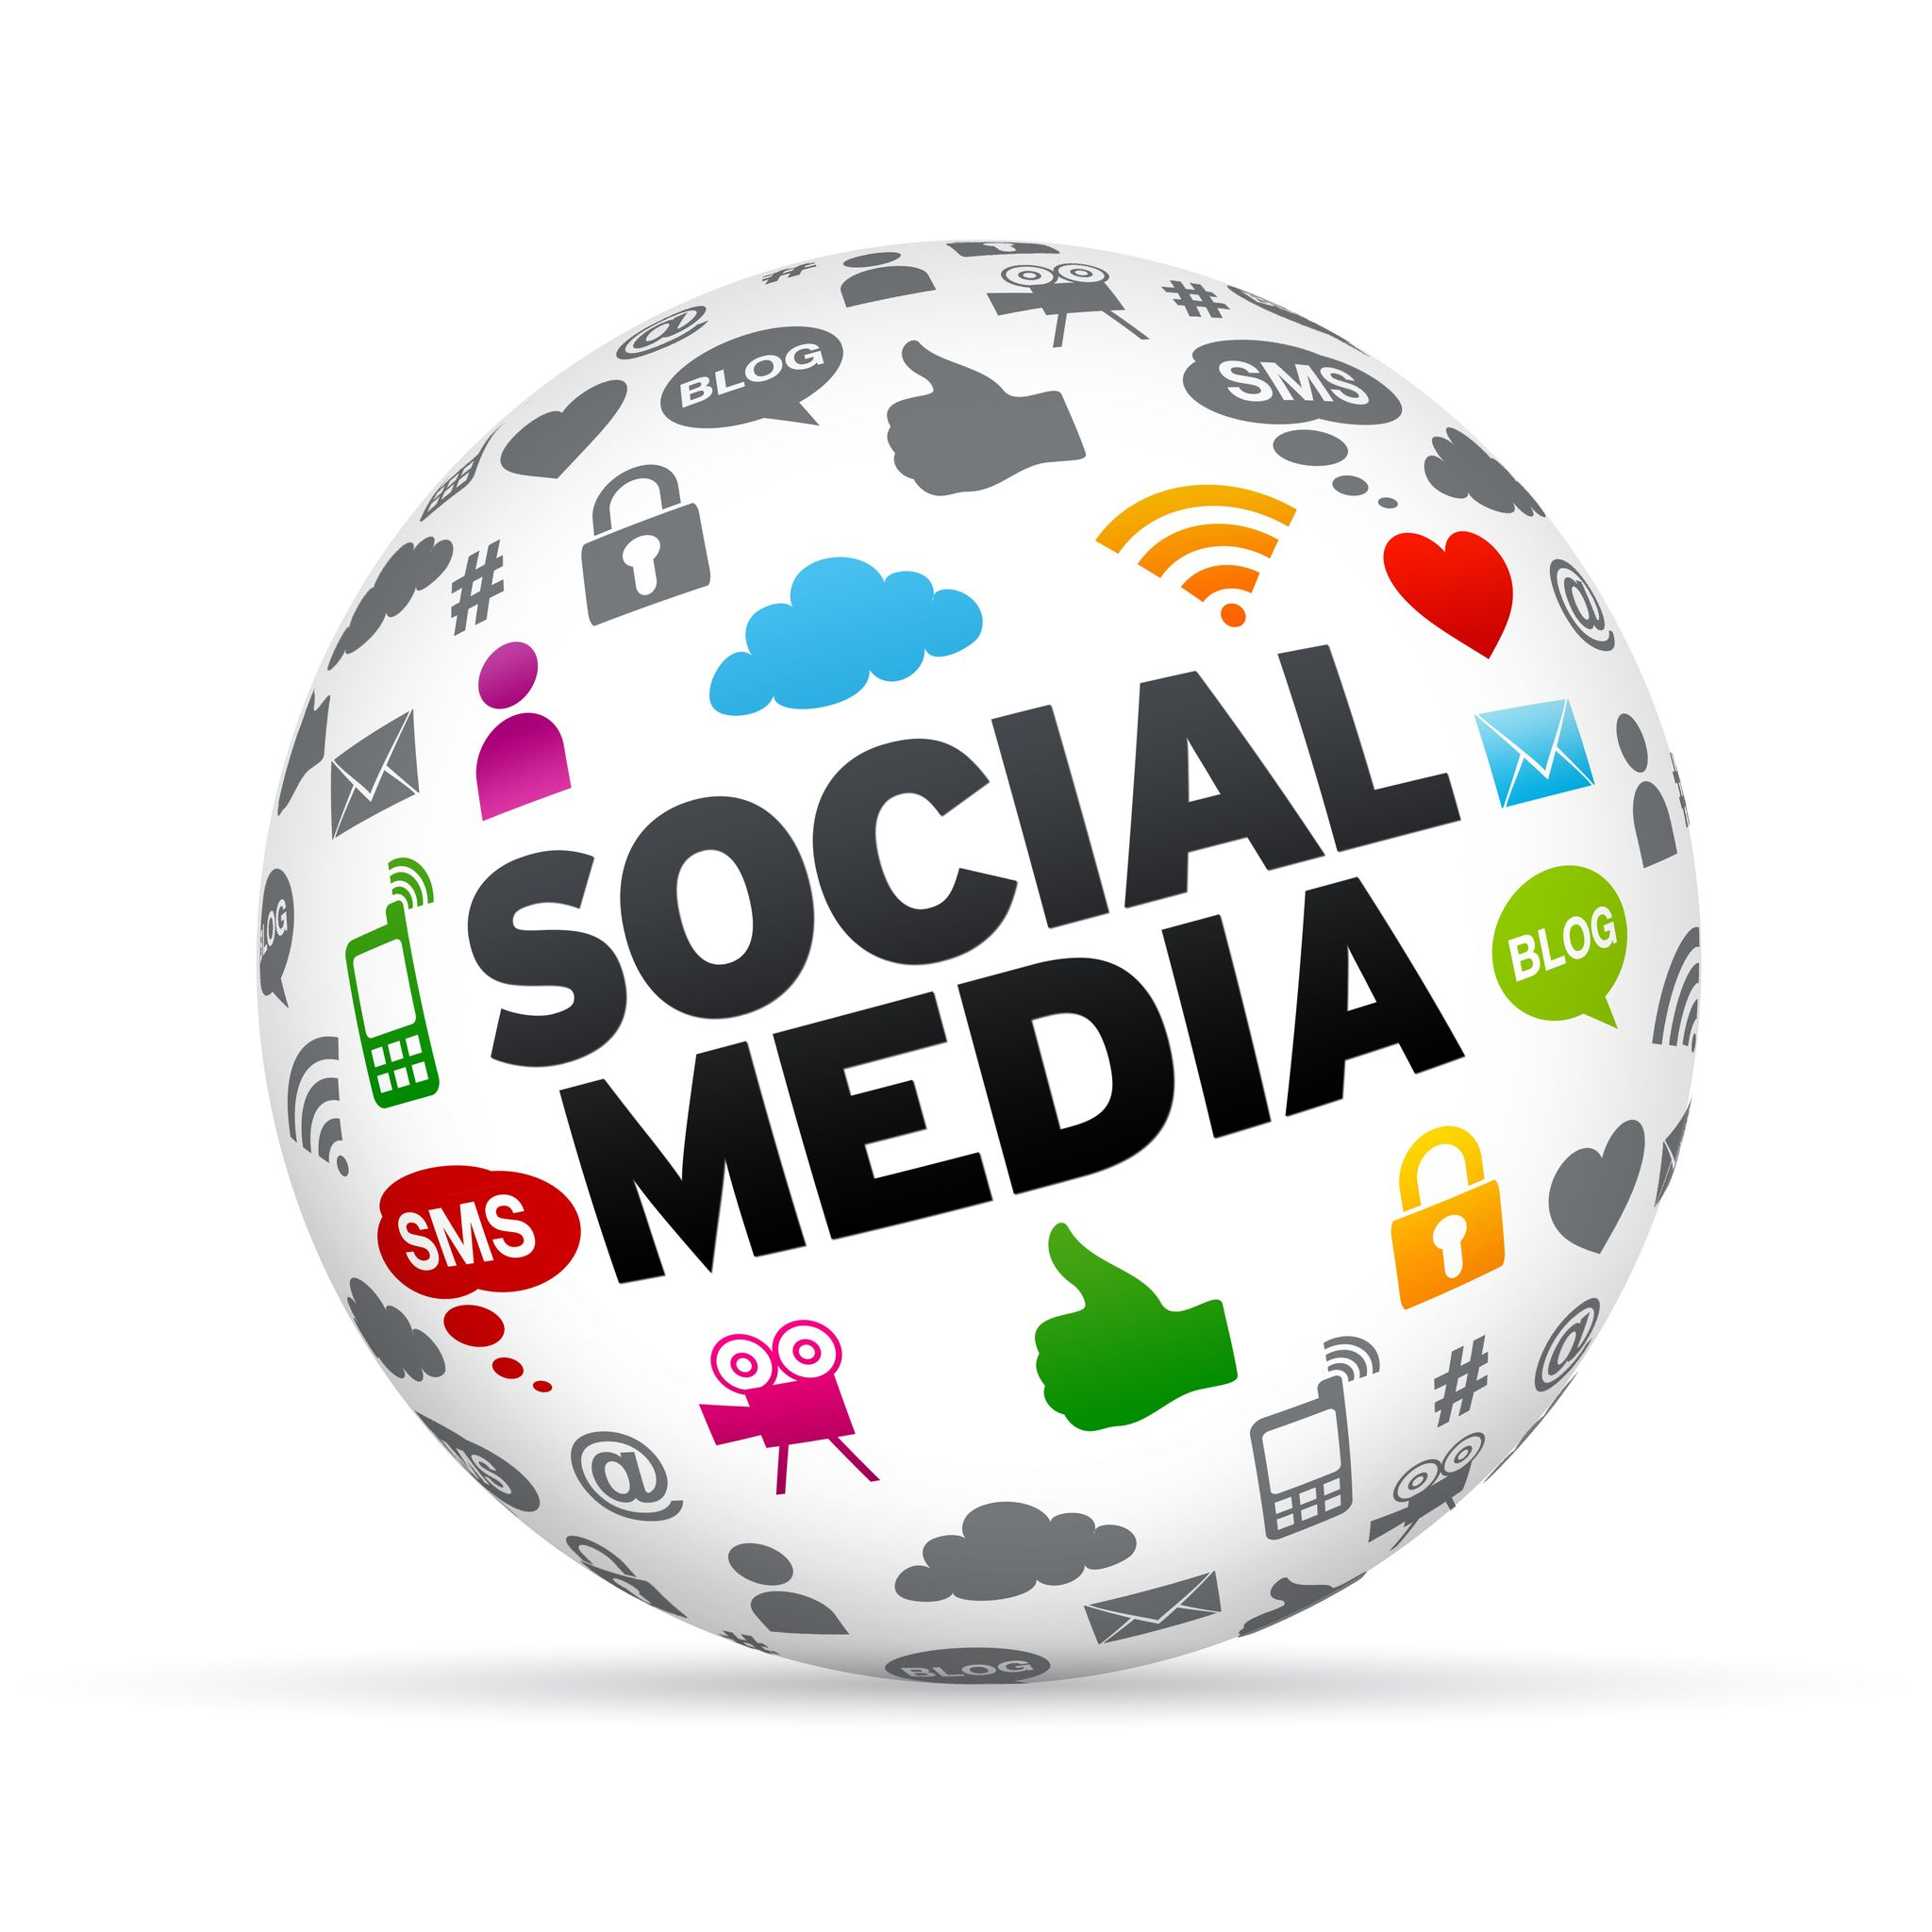 social-media-instagram-facebook-twitter-youtube-icons_331475.png